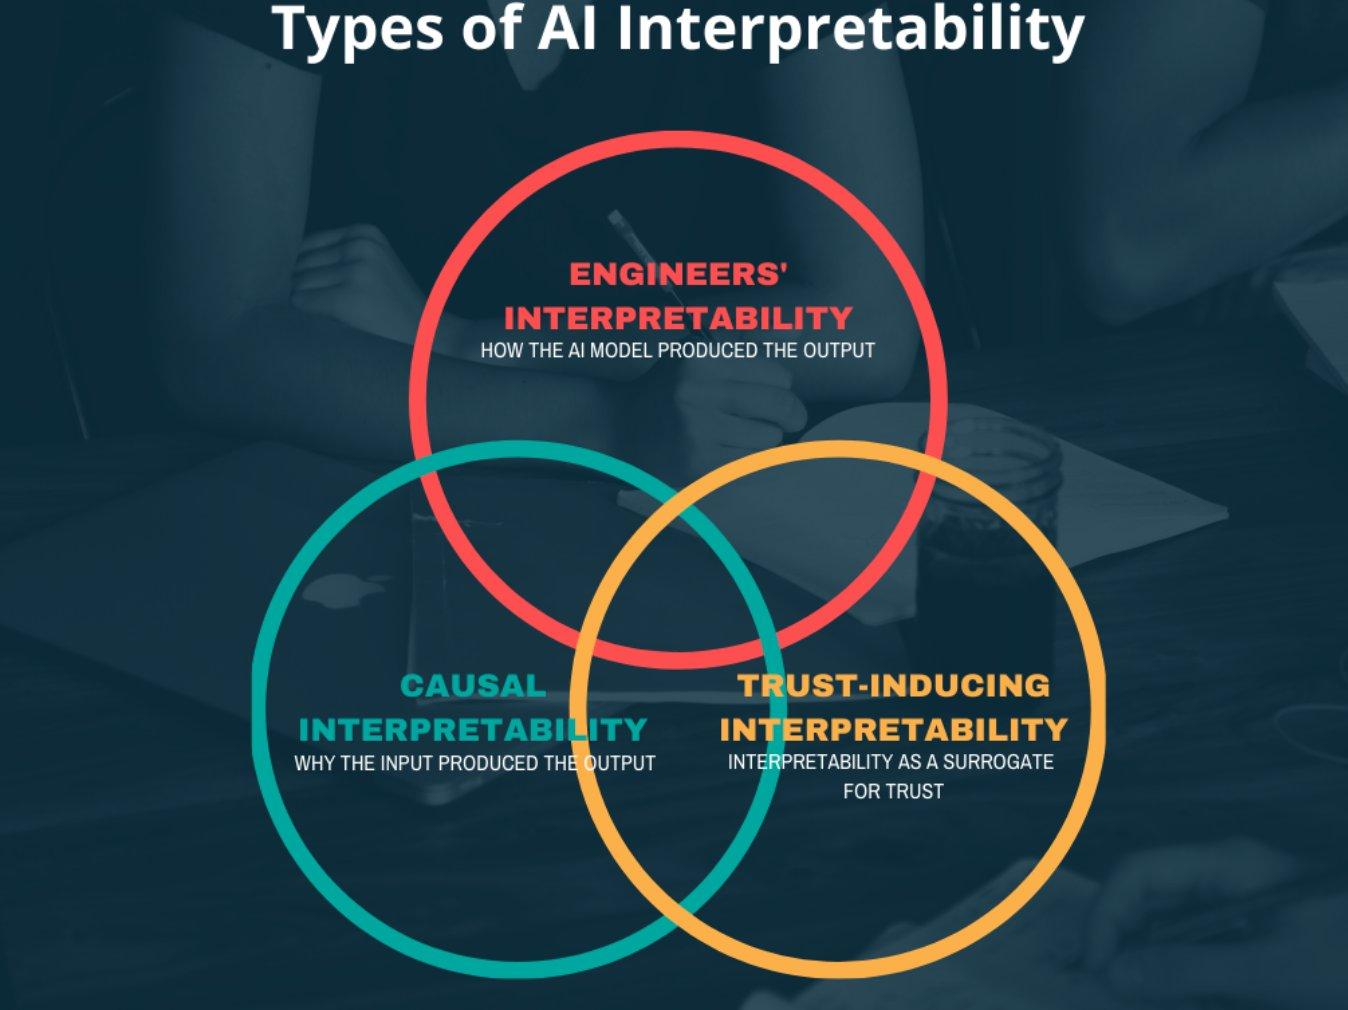 Tres circulos em intersecção.. No primeiro está escrito Engineering Interpretability; no segundo, Causal Interpretability; no terceiro Trust-Inducing Interpretability